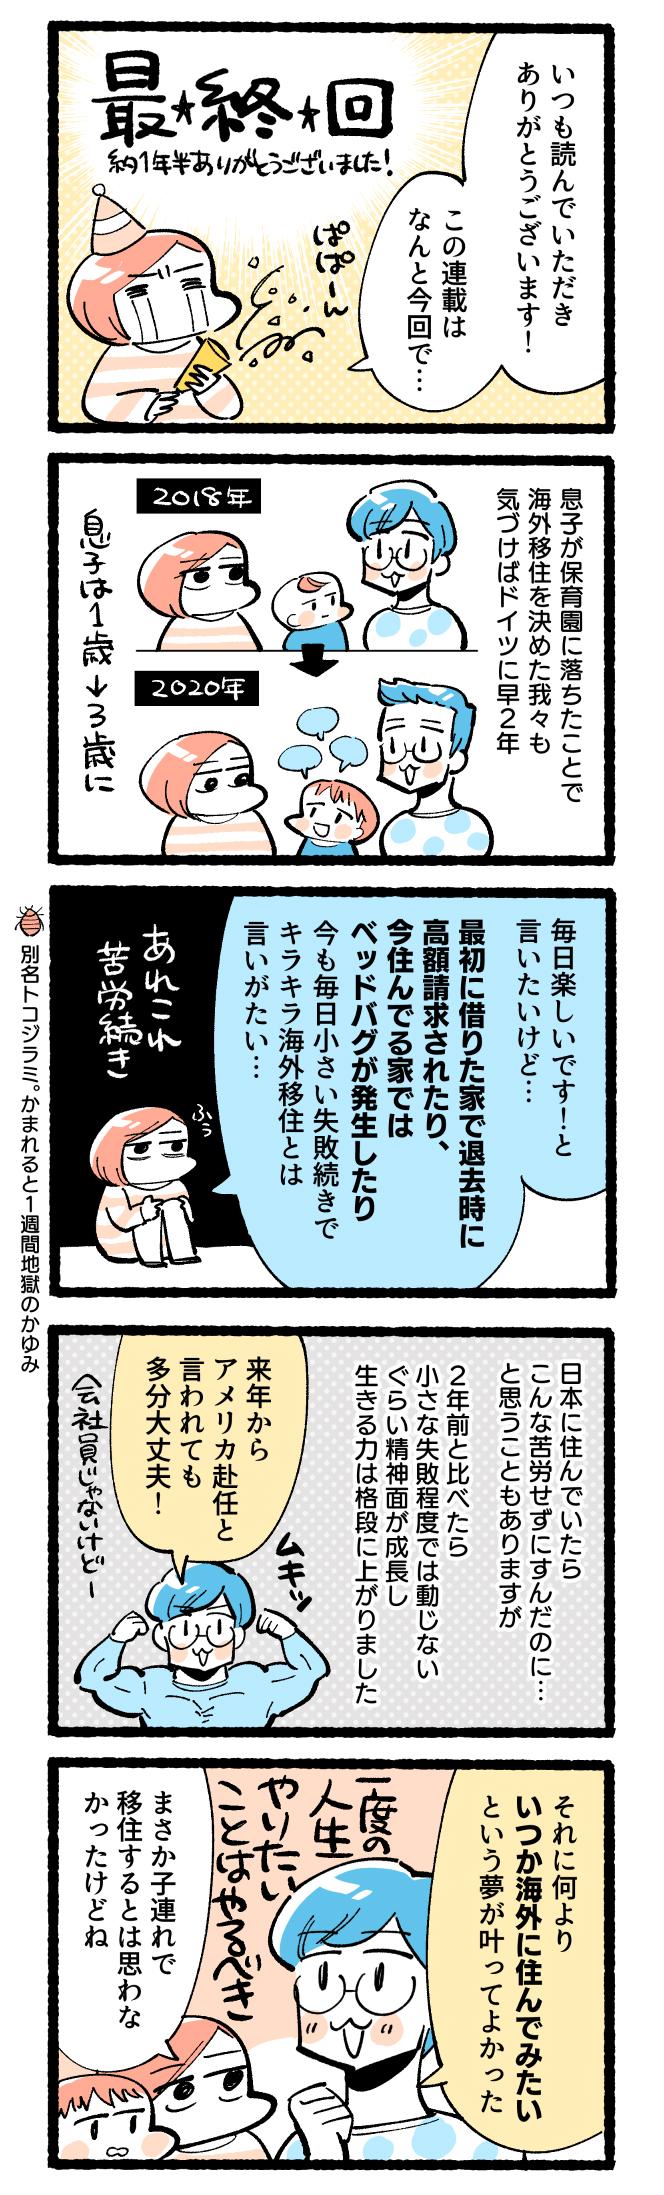 https://cdn-ak.f.st-hatena.com/images/fotolife/i/i_magawa/20200801/20200801180349_original.jpg